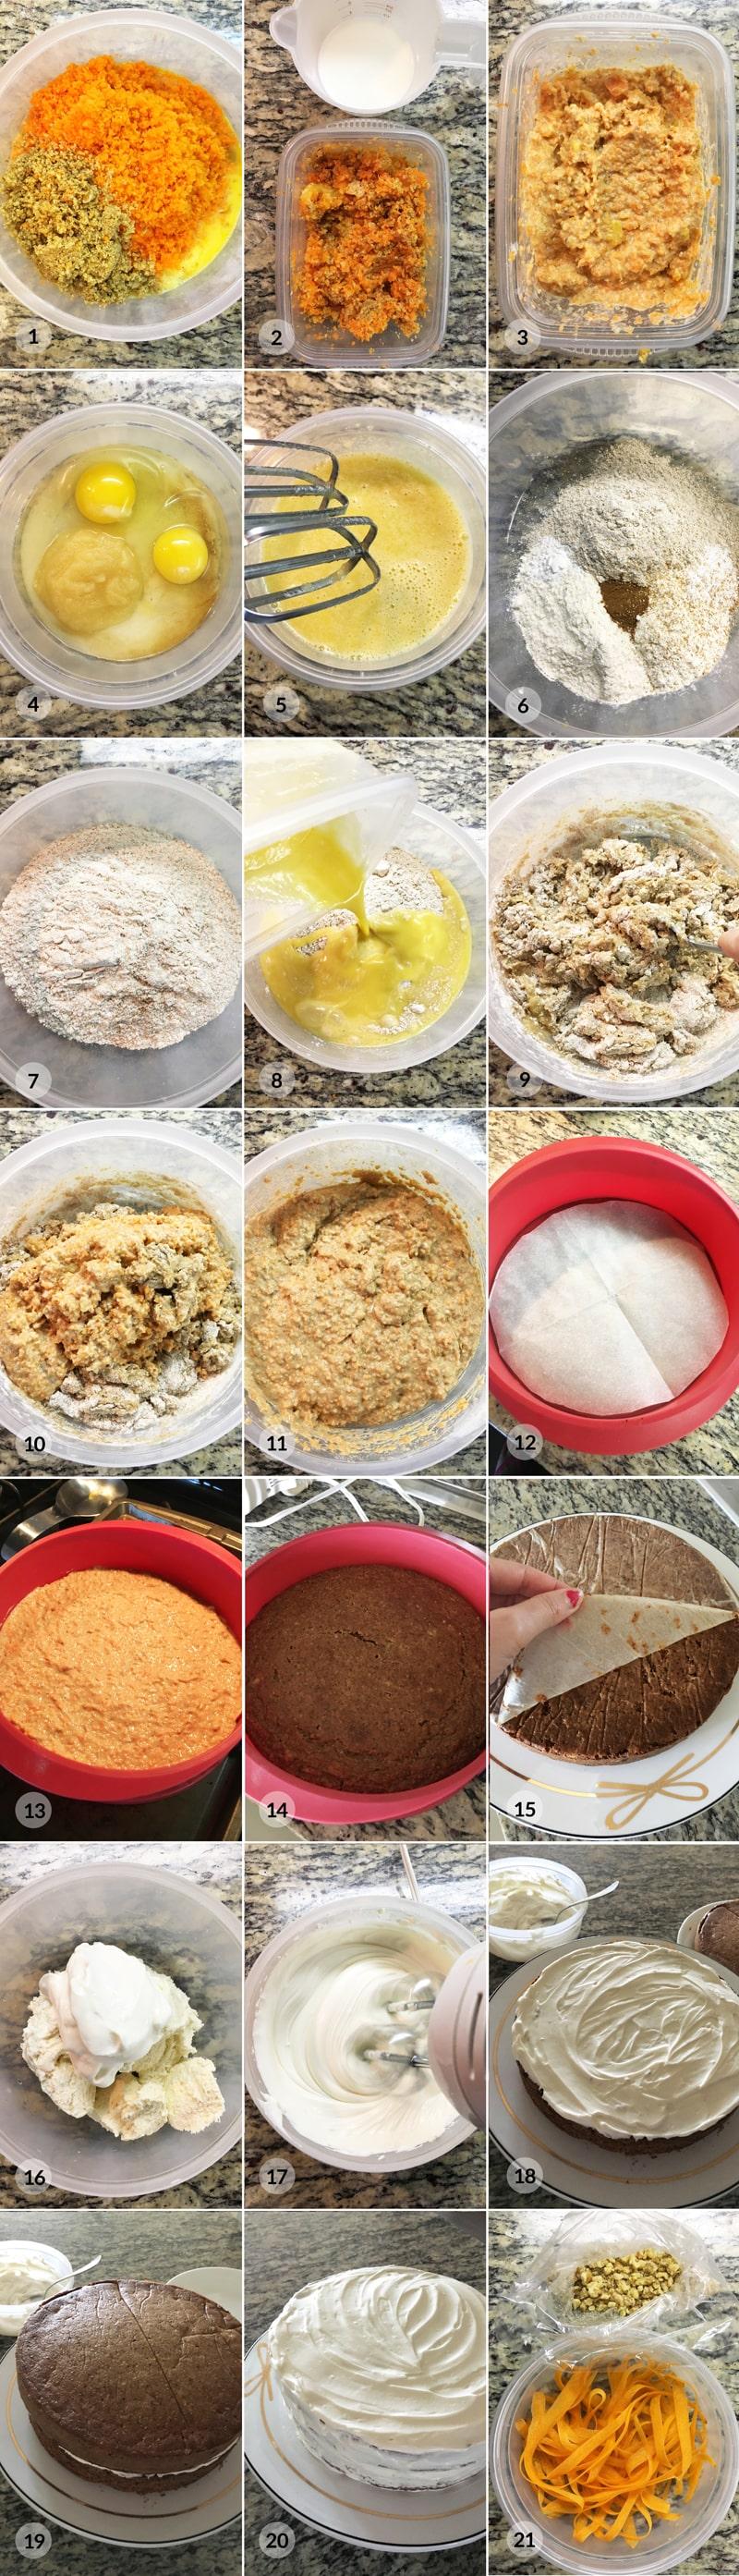 Mrkvový dort foto postup receptu